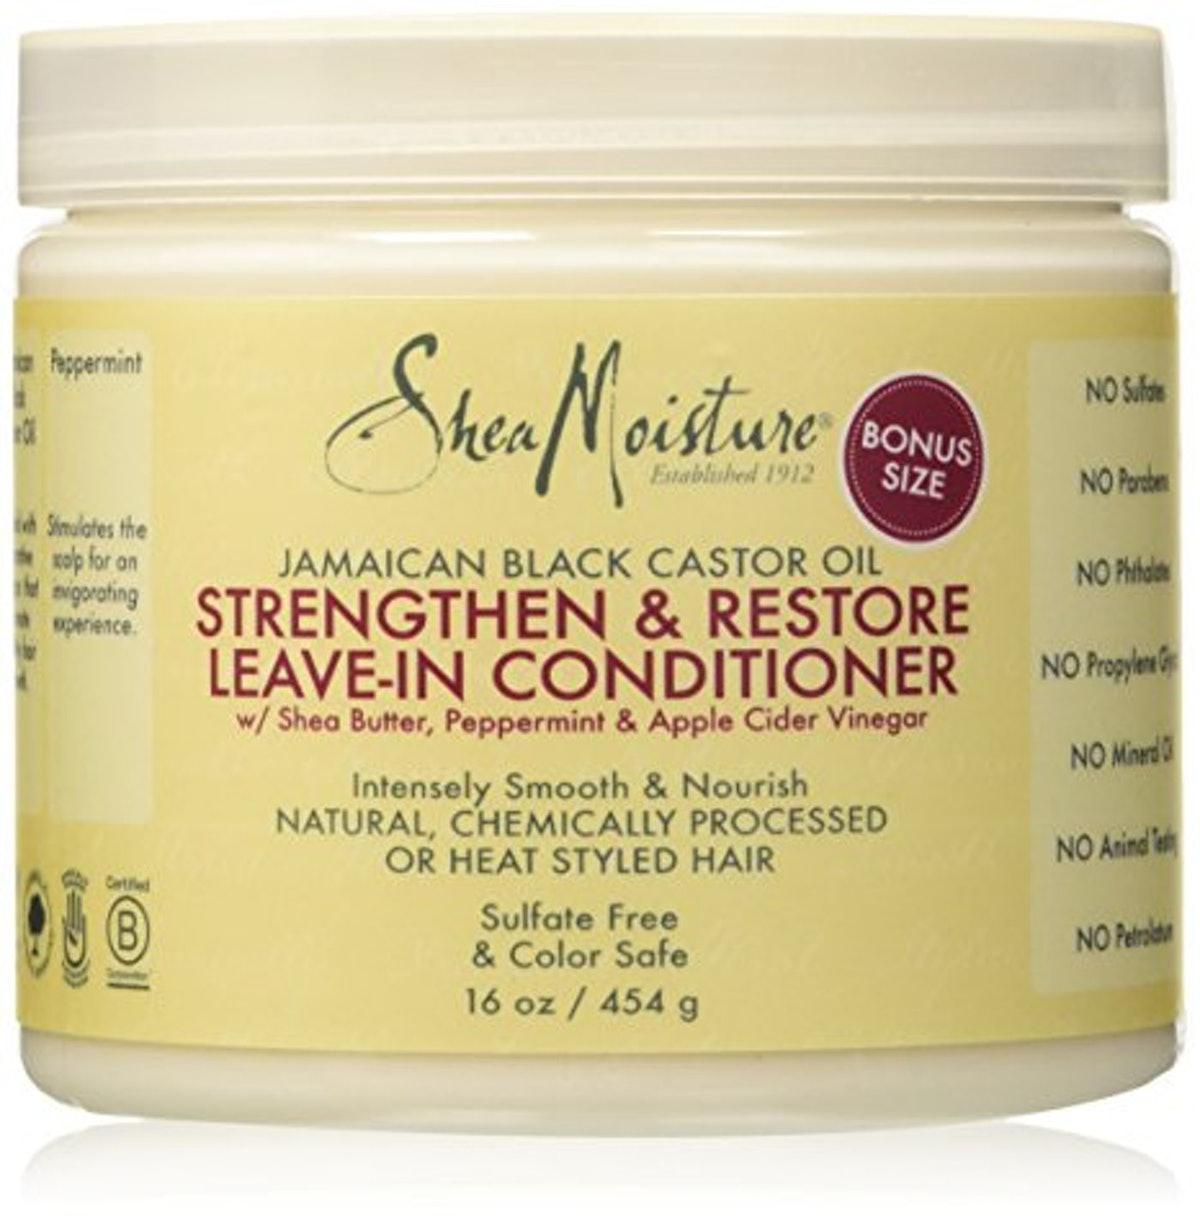 SheaMoisture Jamaican Black Castor Oil Strengthen & Restore Leave-In Conditioner